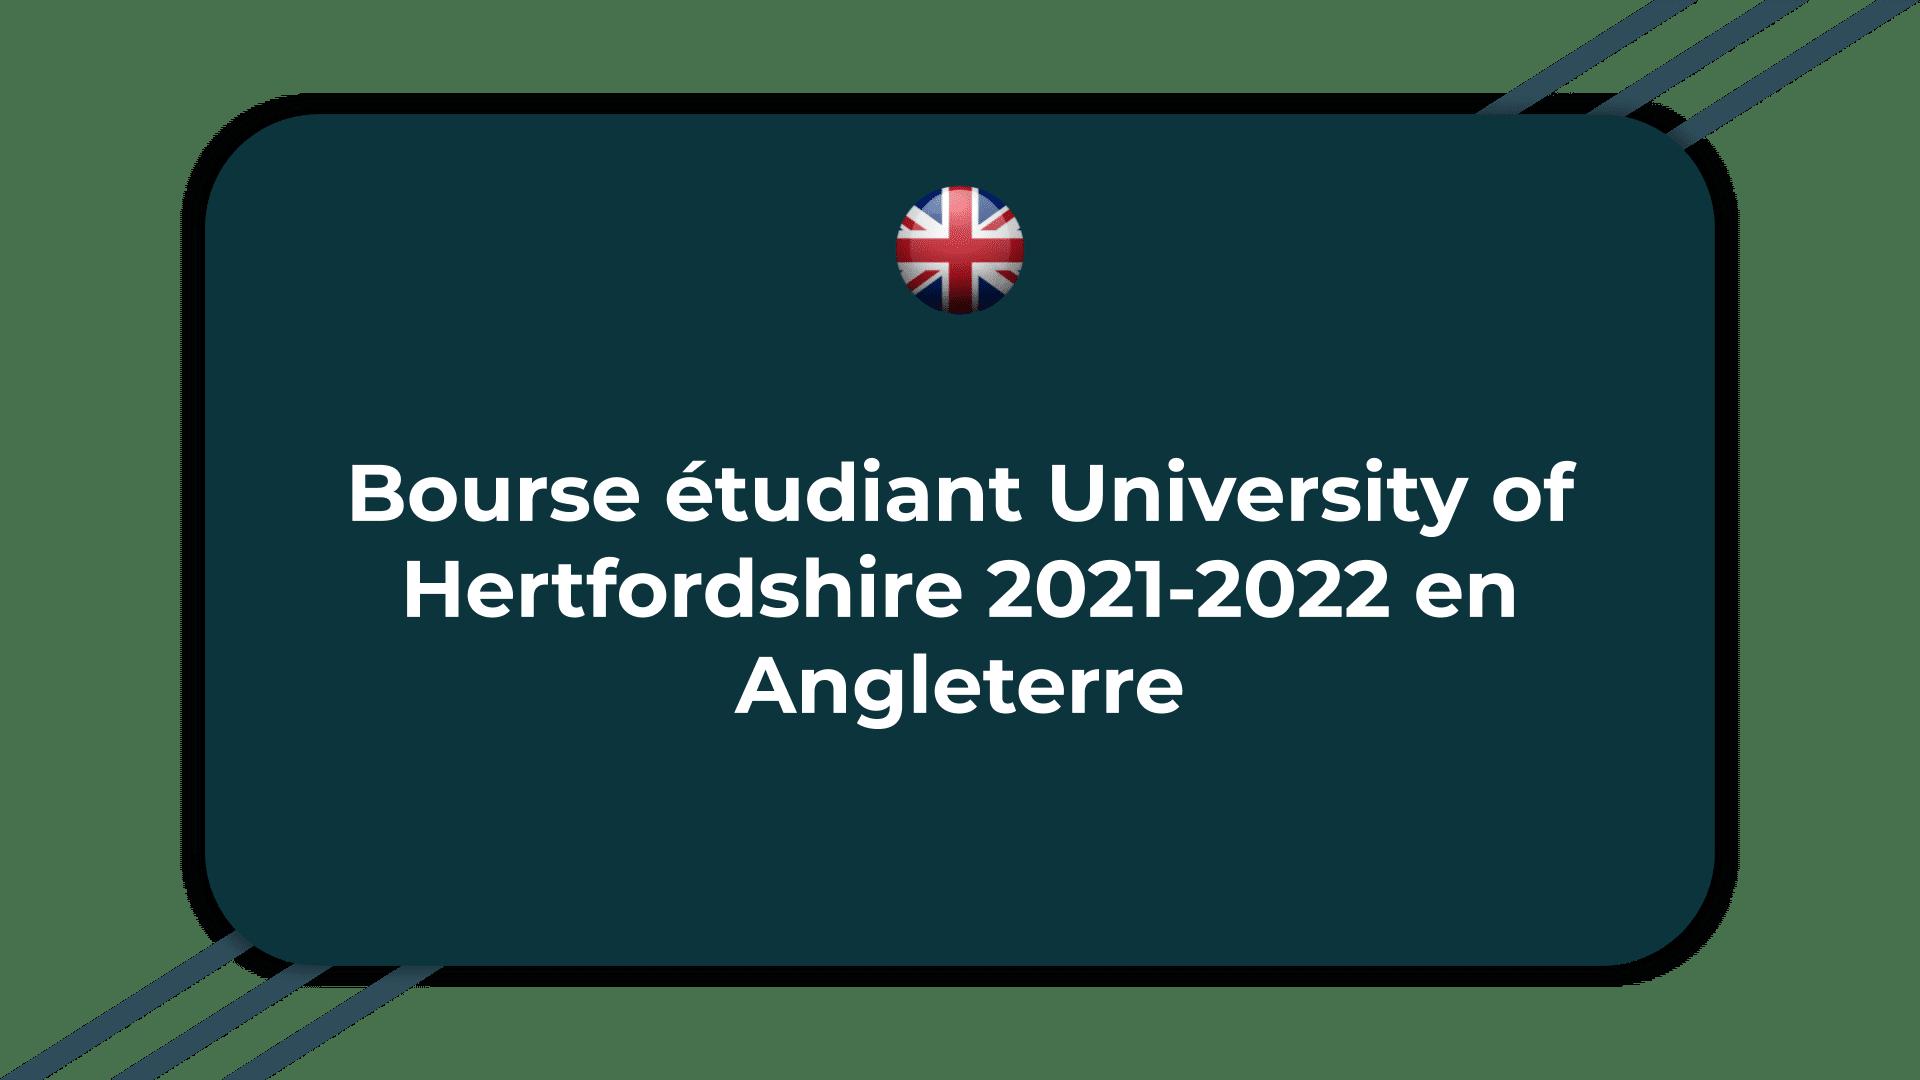 Bourse étudiant University of Hertfordshire